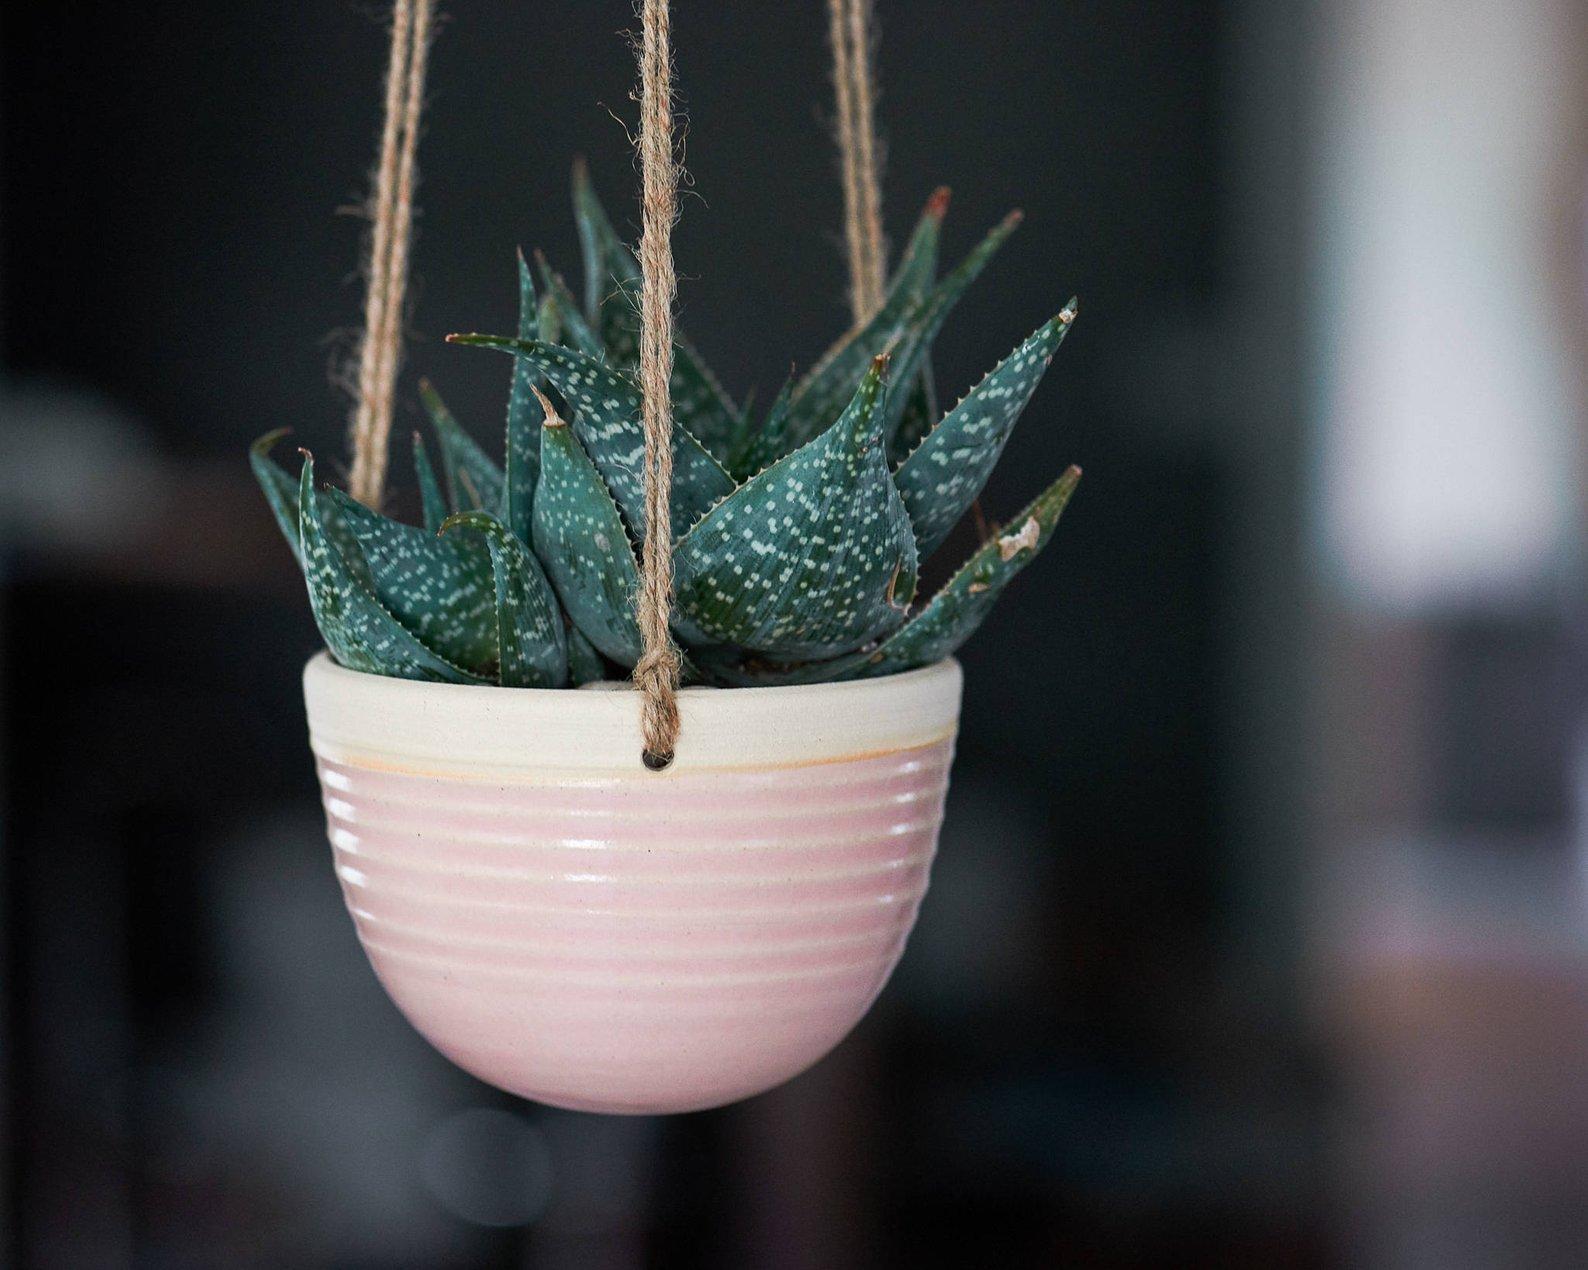 Handmade Planter in Blush Pink By Jennifer Beachy